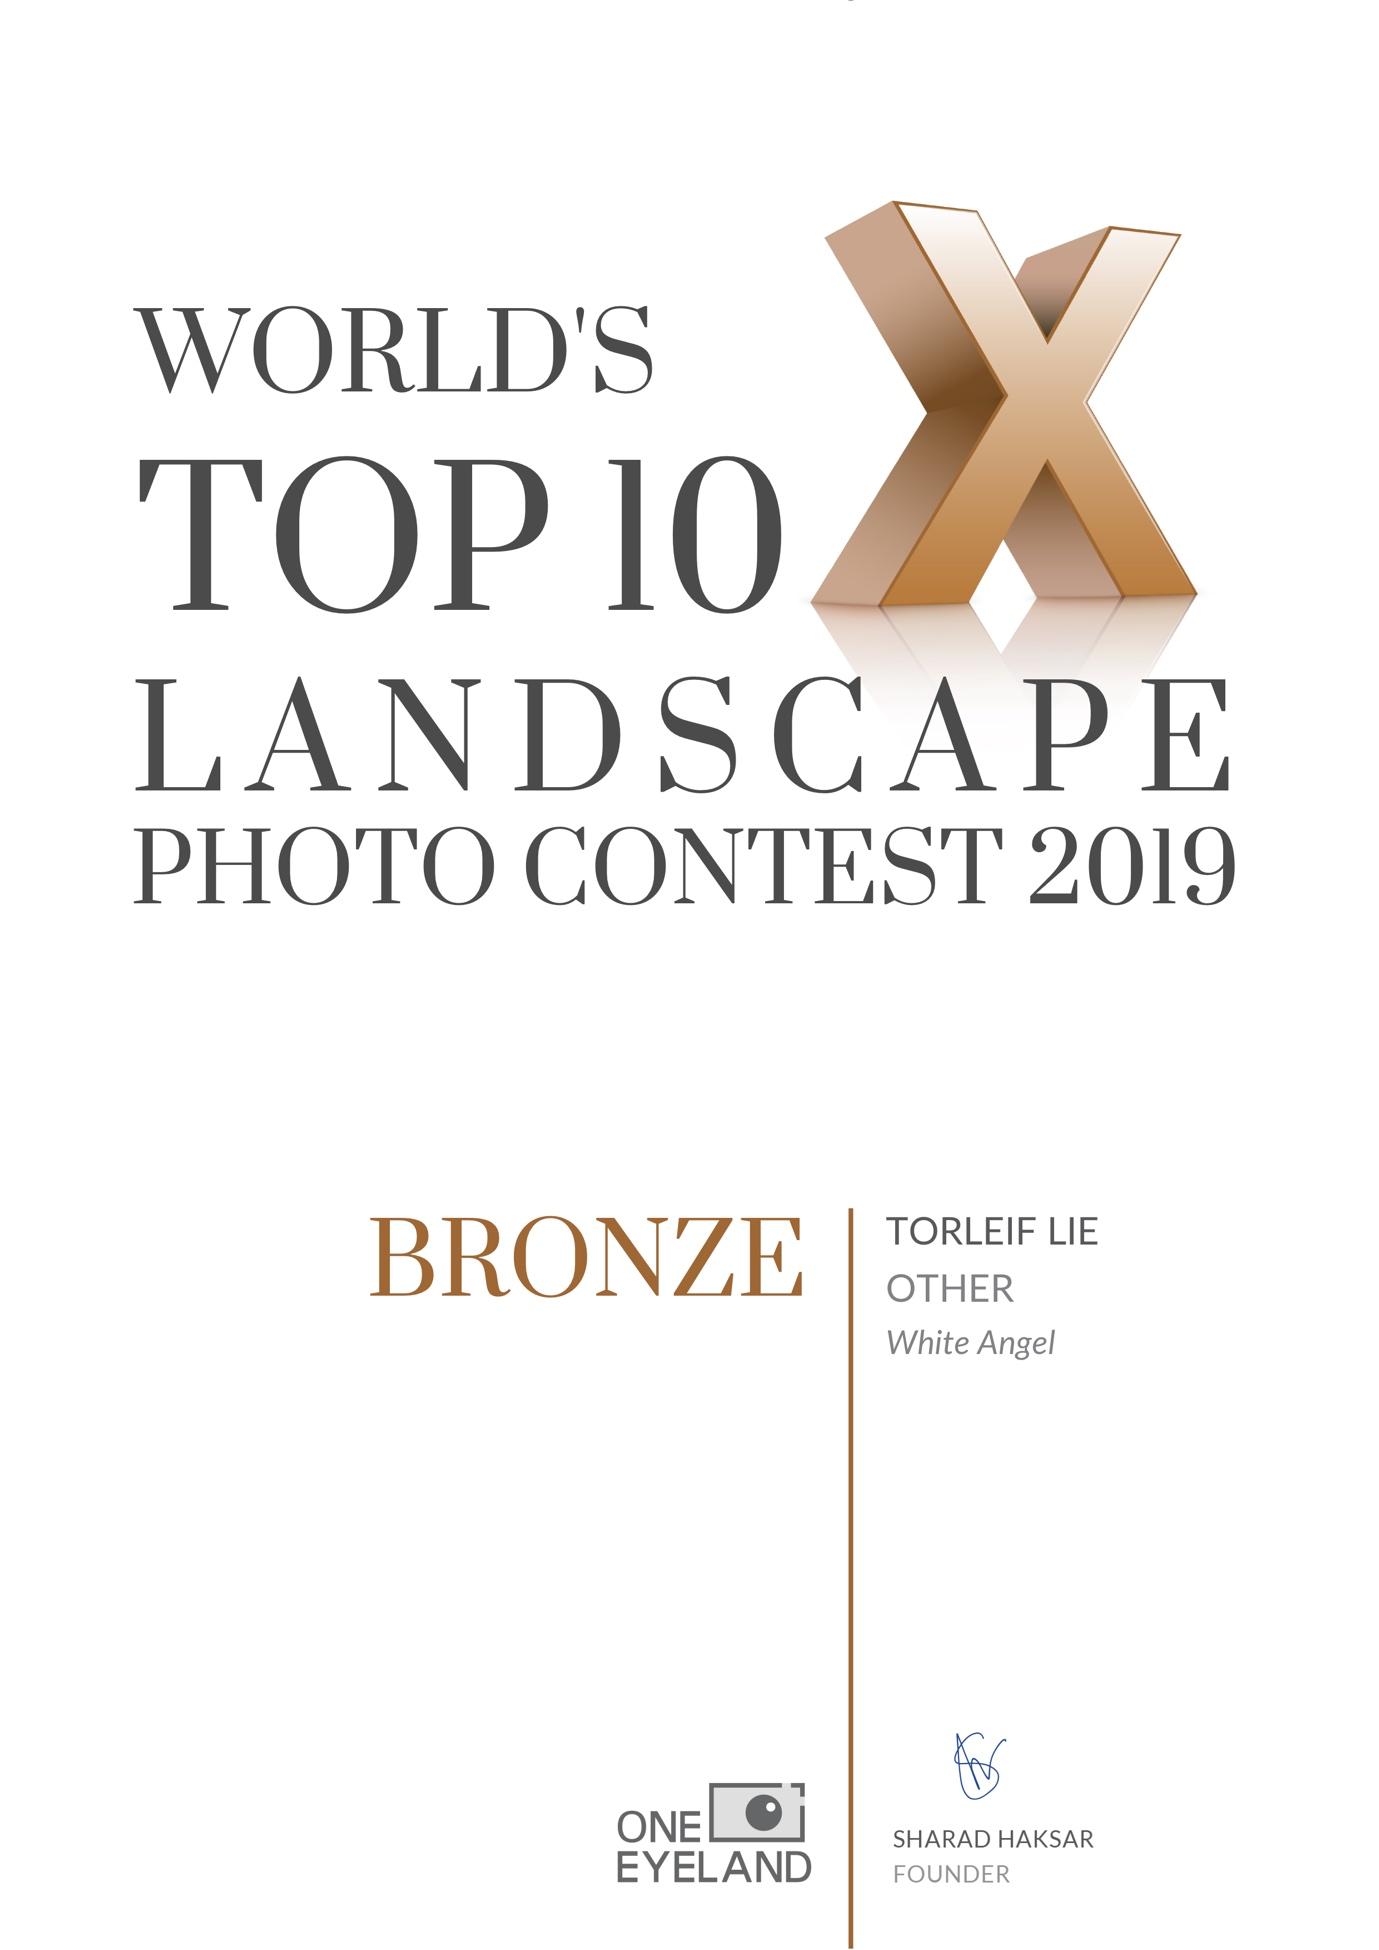 White-Angel-bronze-landscape-other-2019